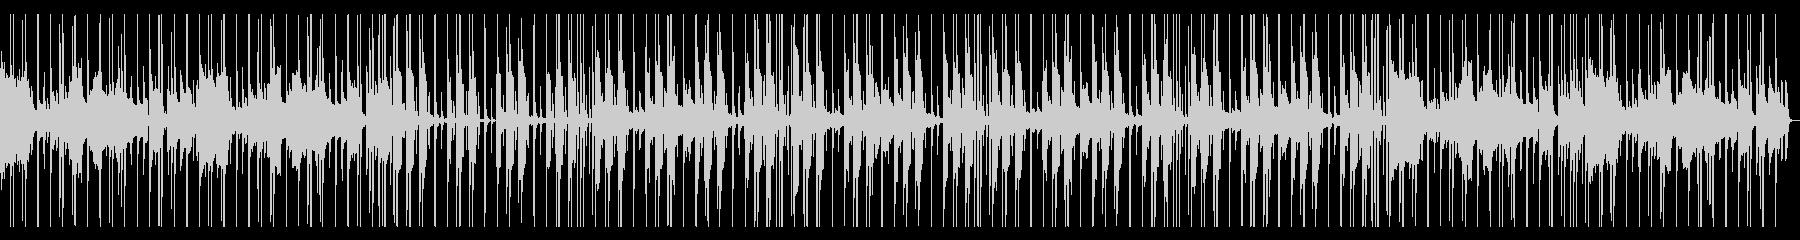 Lofiピアノのゆったりヒップホップの未再生の波形